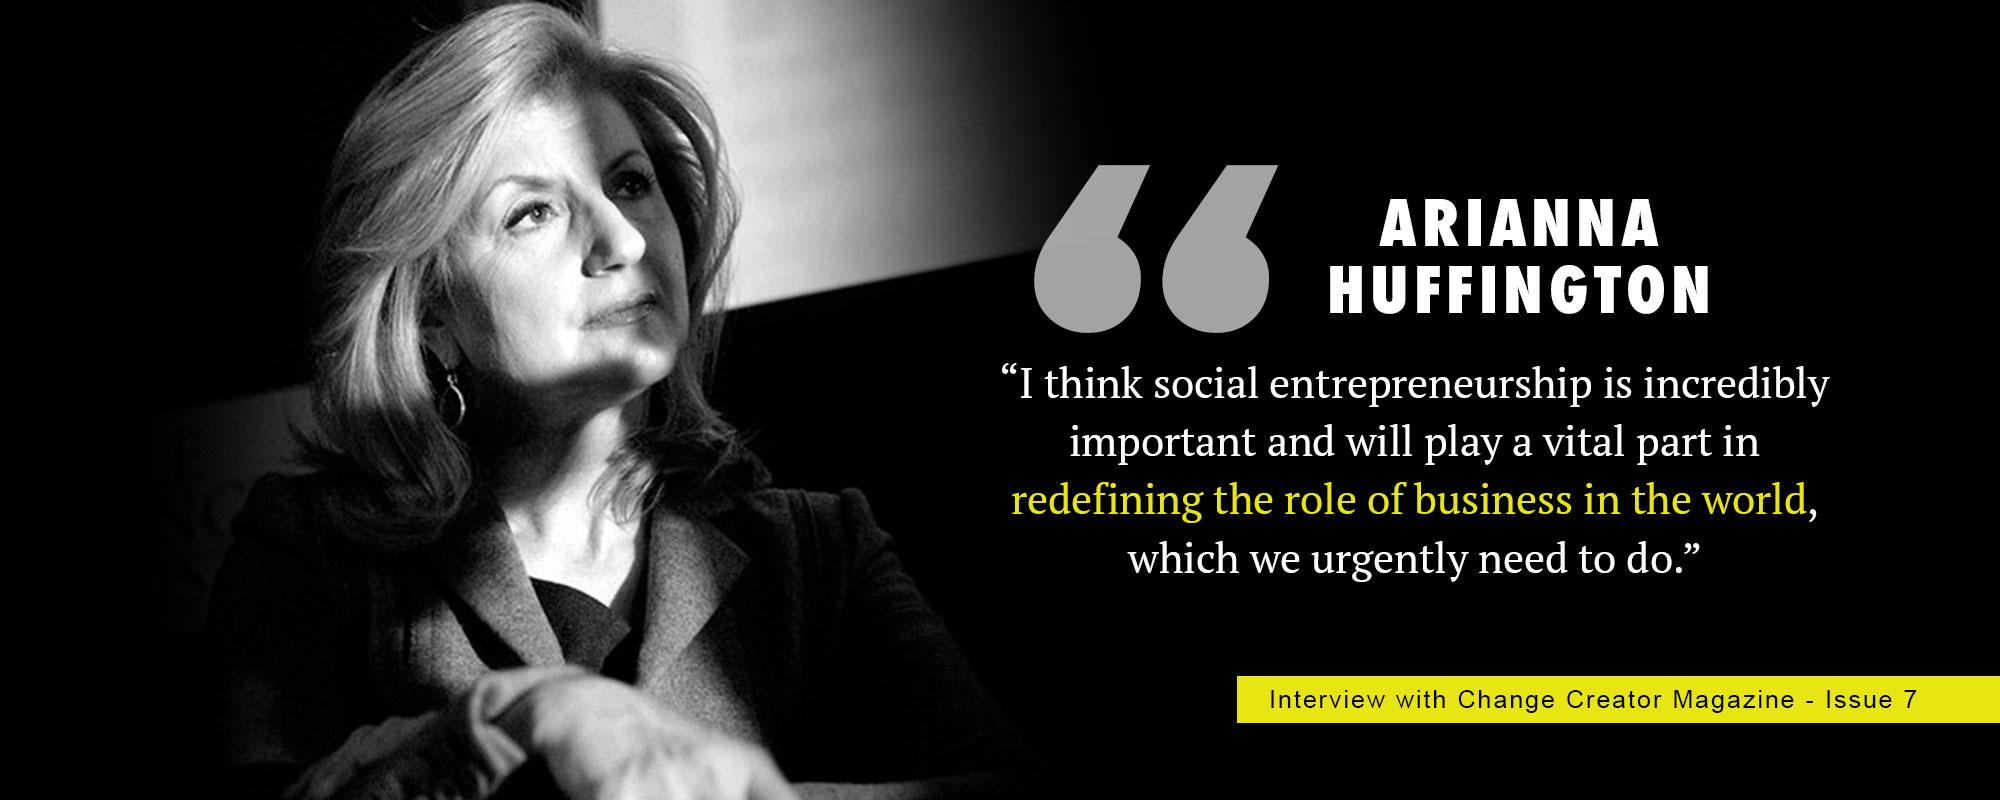 about change creator - arianna huffington